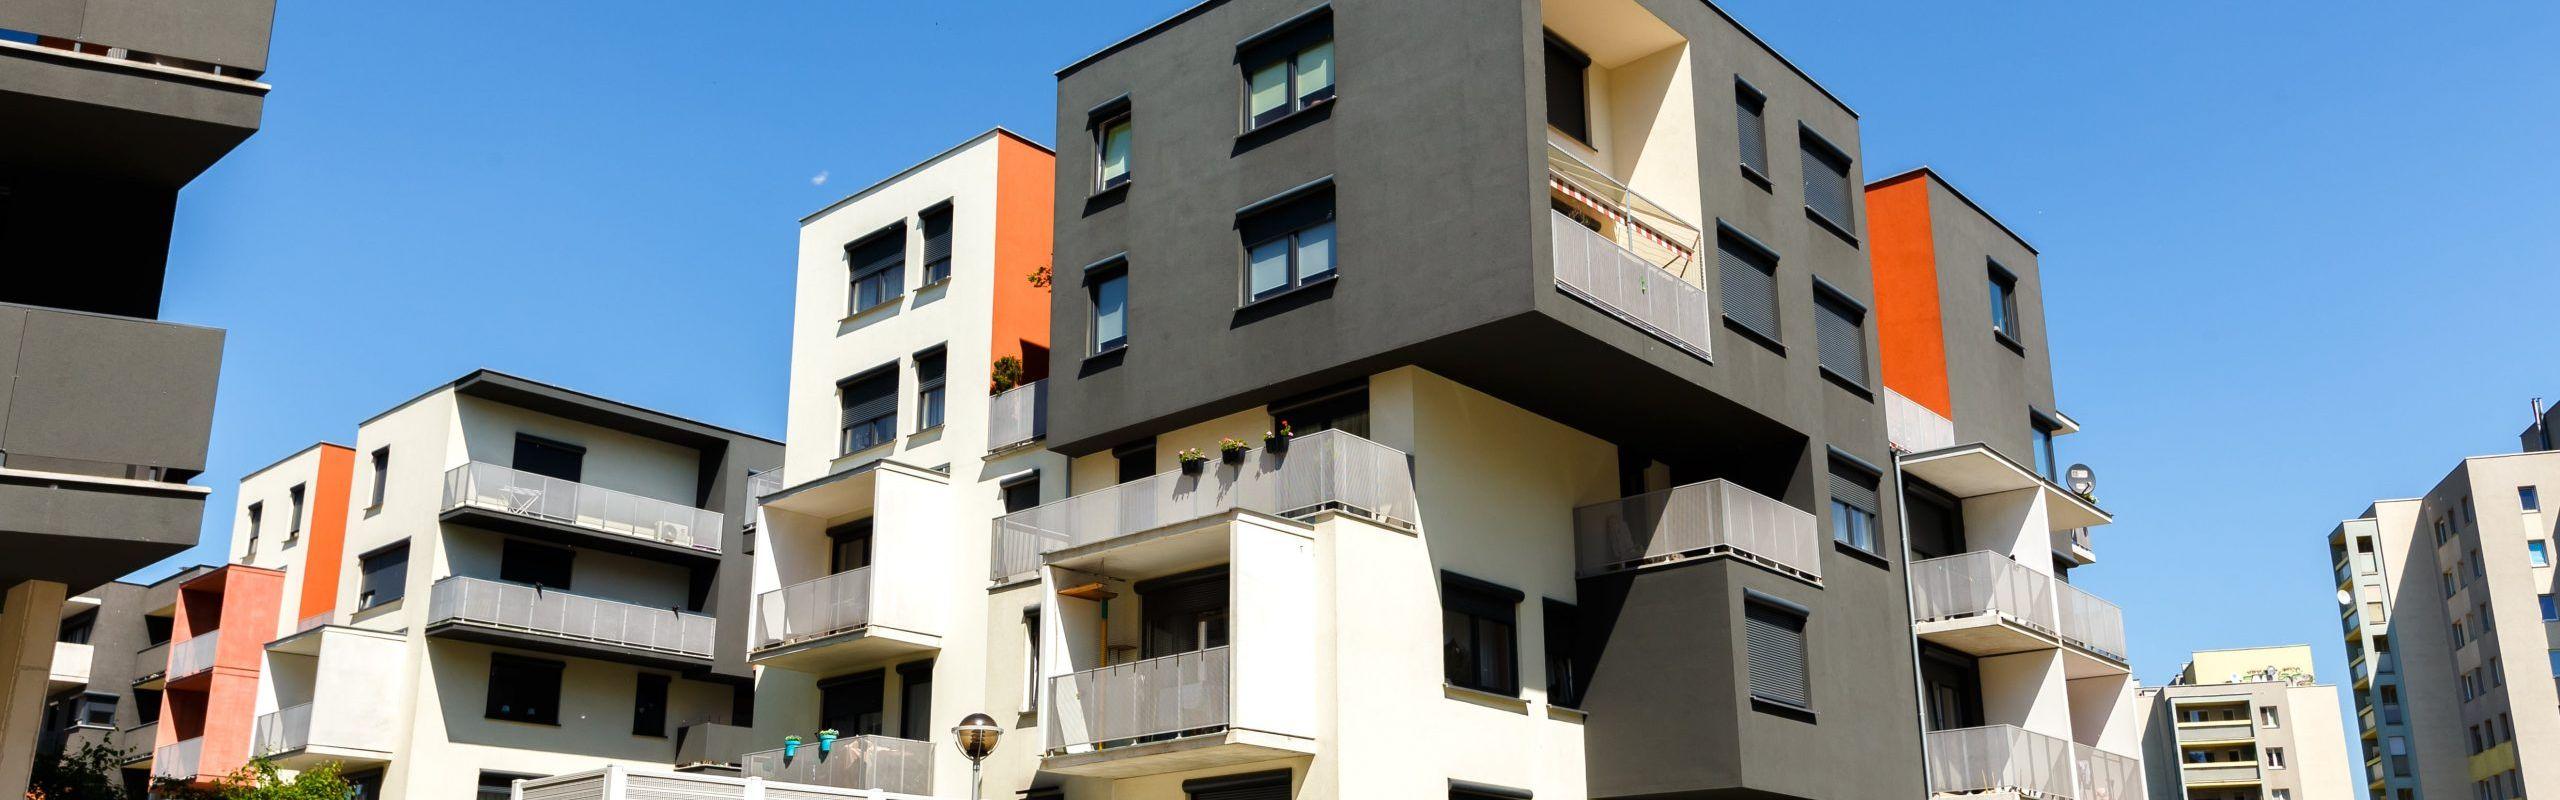 exterior-modern-apartment-buildings-h800